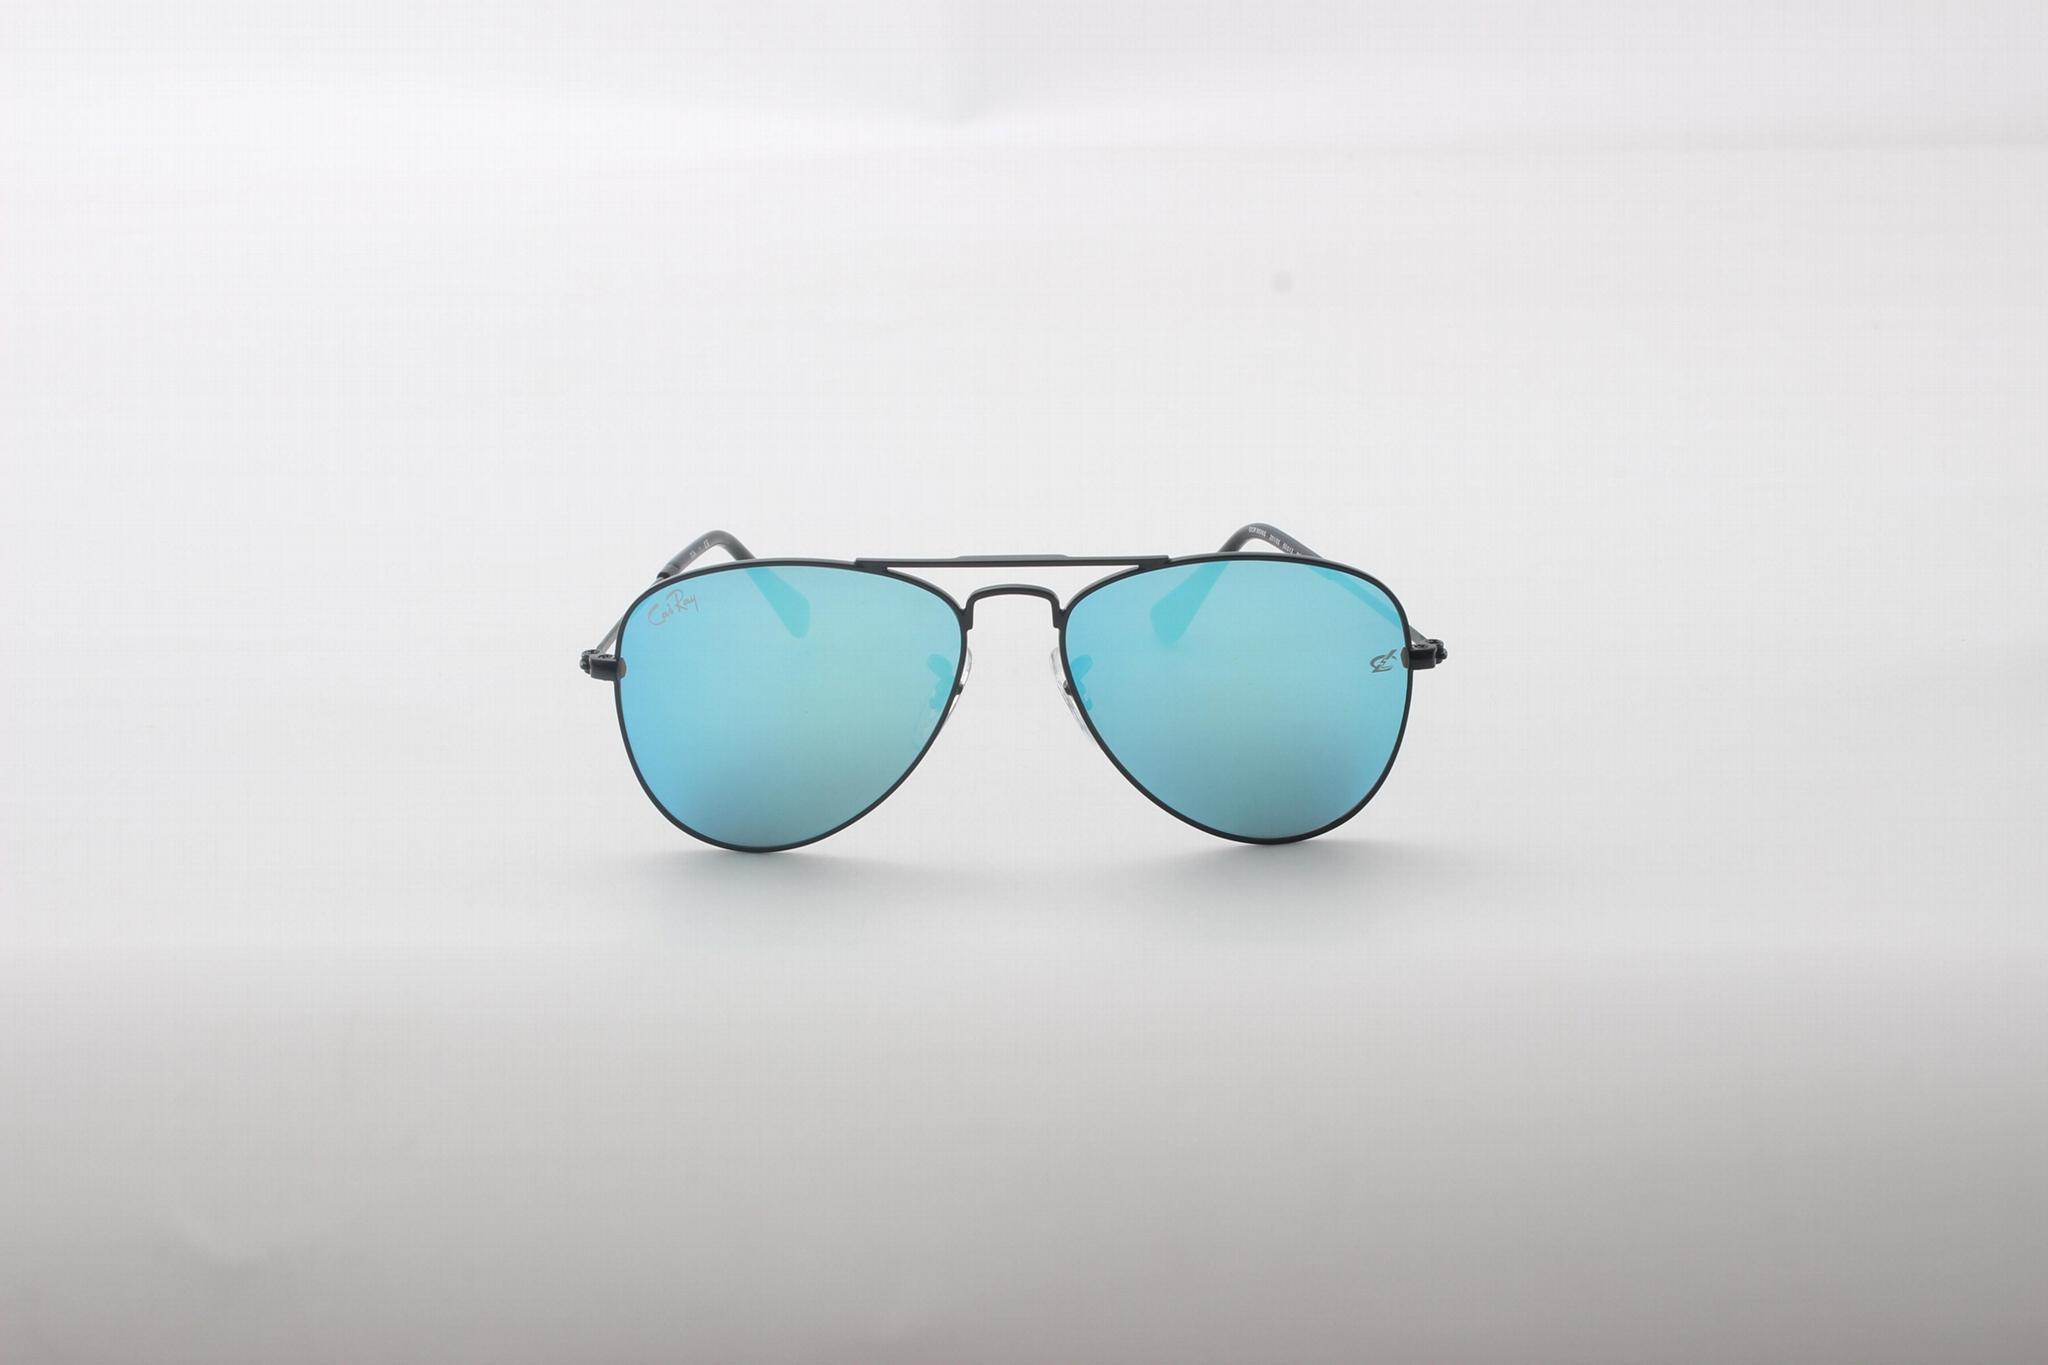 Cai Ray original kids sunglasses CR9506 201/5S black/ blue flash lens 50mm UV400